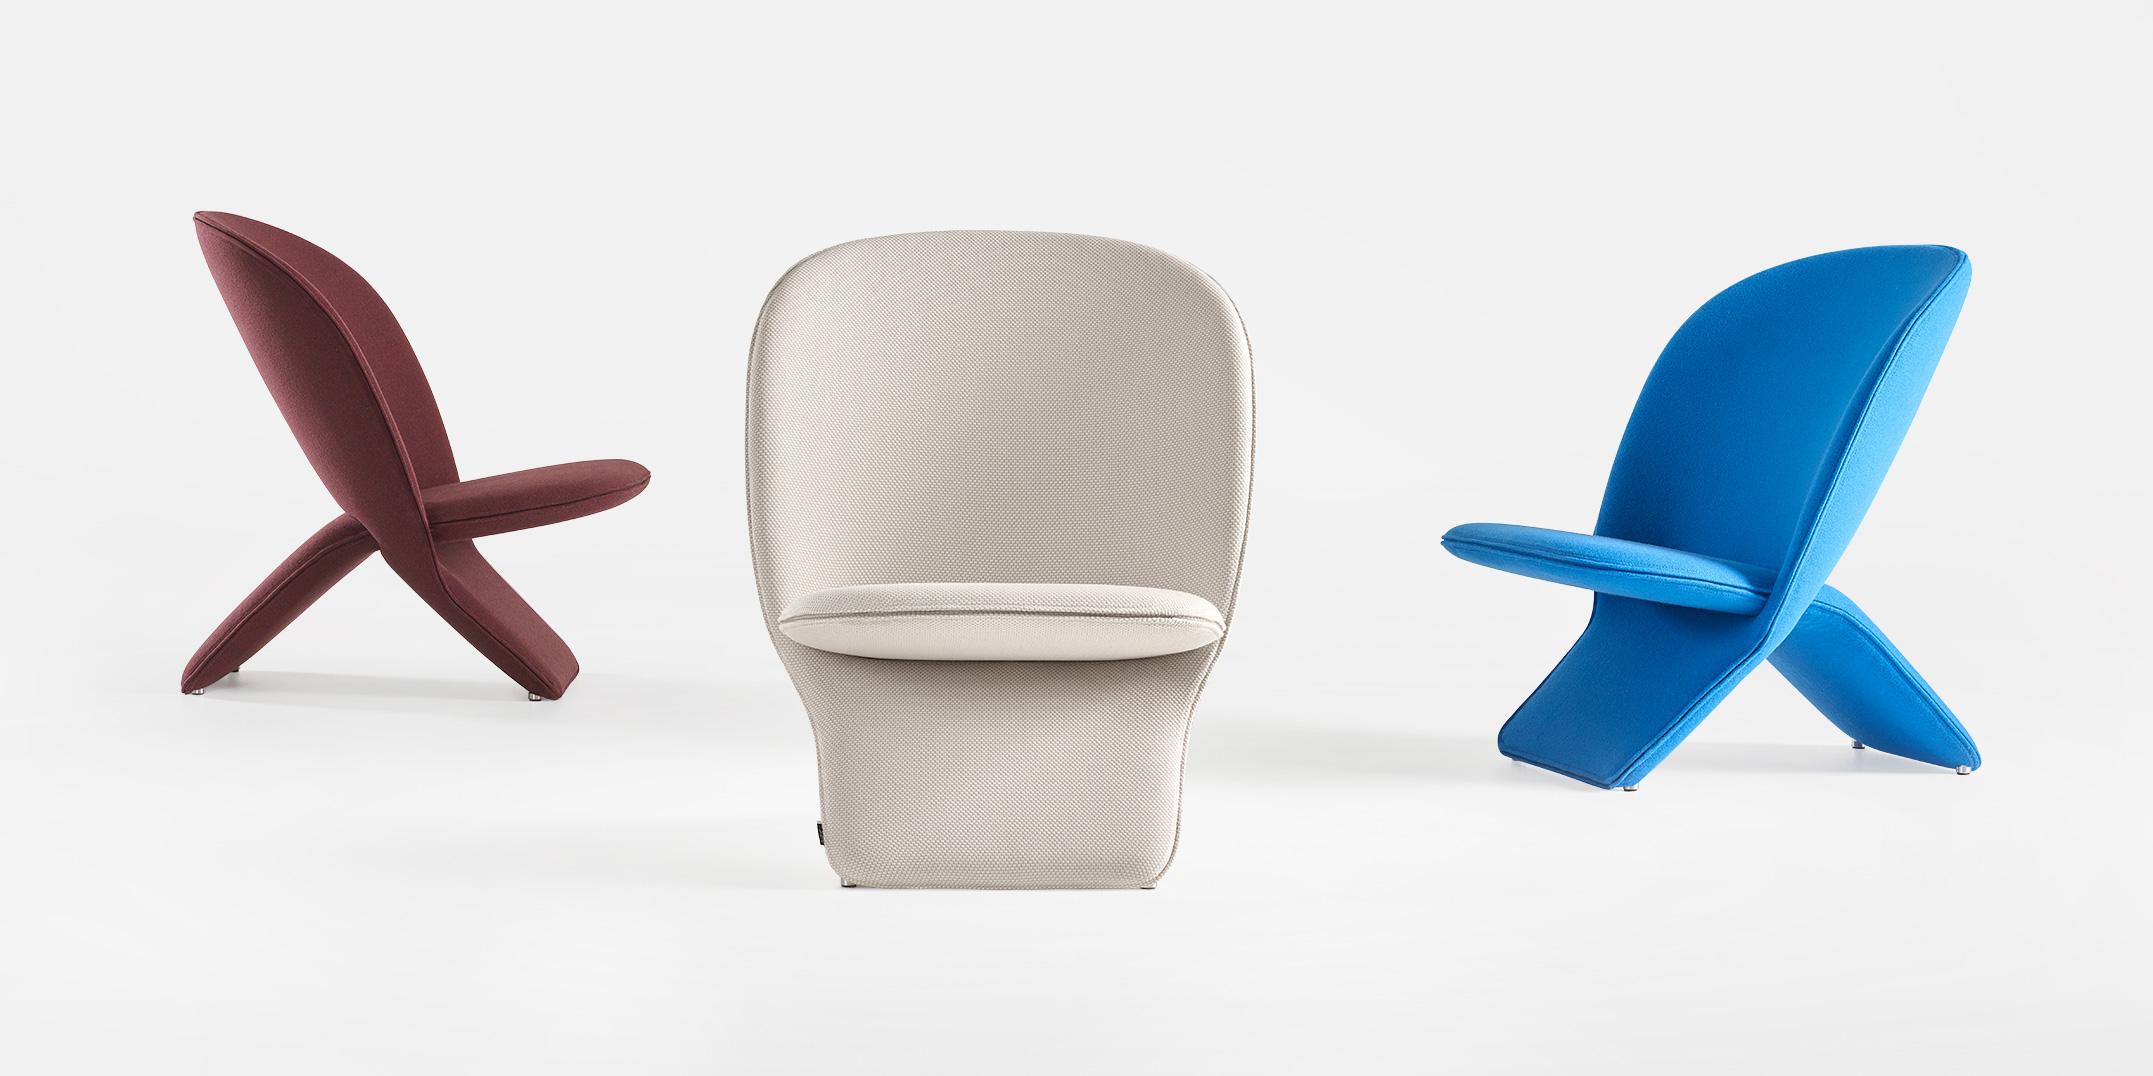 Niloo Chair by Khodi Feiz -  starting price is $2,016 List